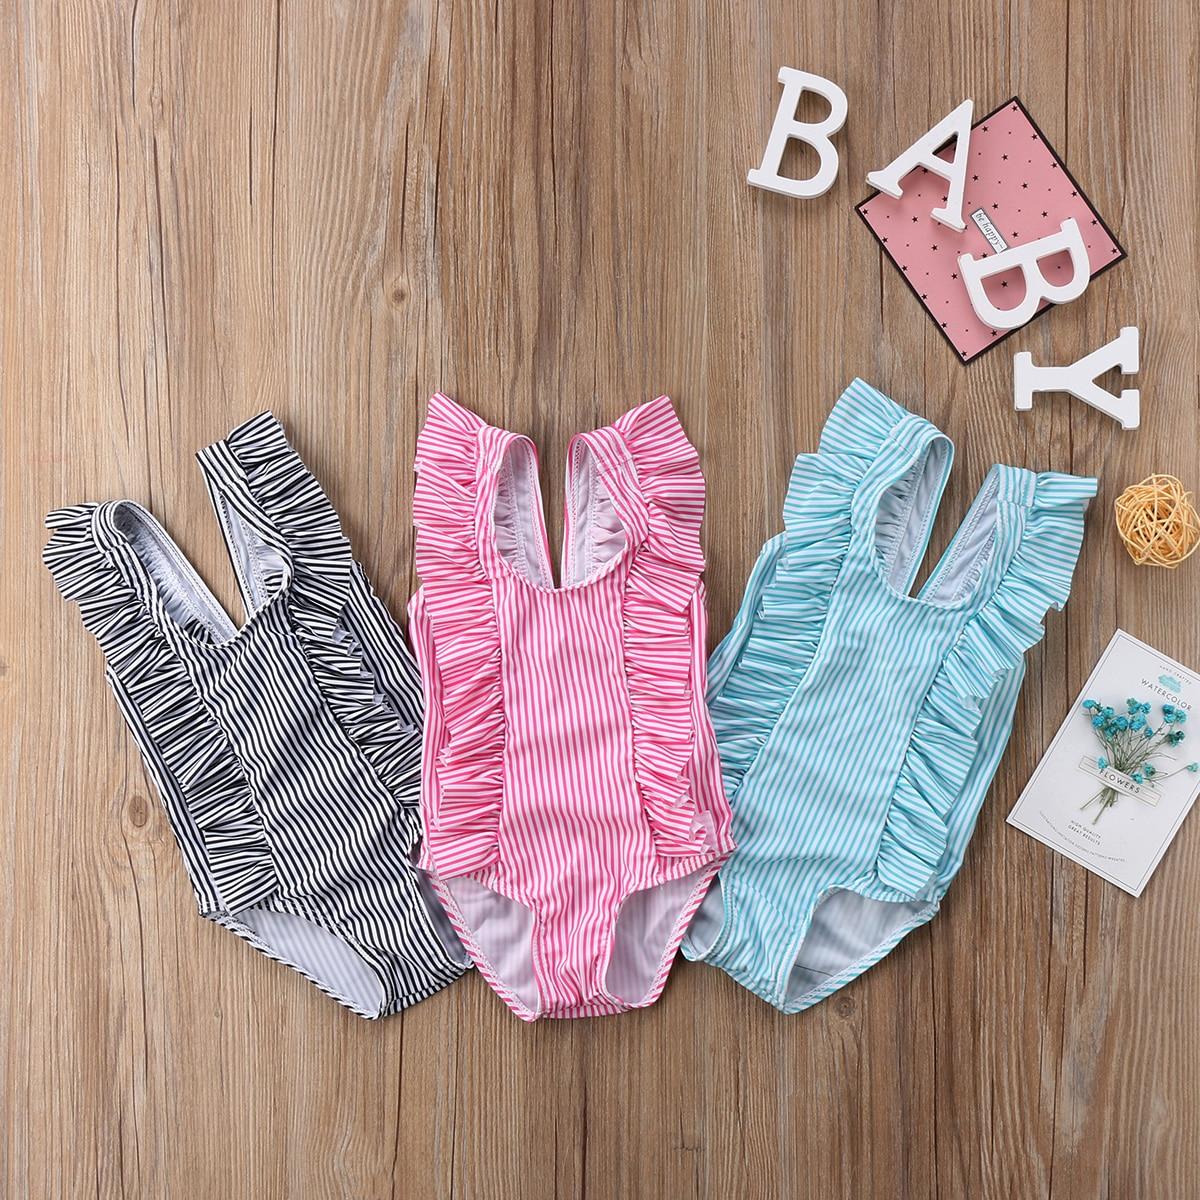 Niño chico bebé niñas traje de baño Bikini conjunto volantes rayas traje de baño traje de bebé recién nacido traje de